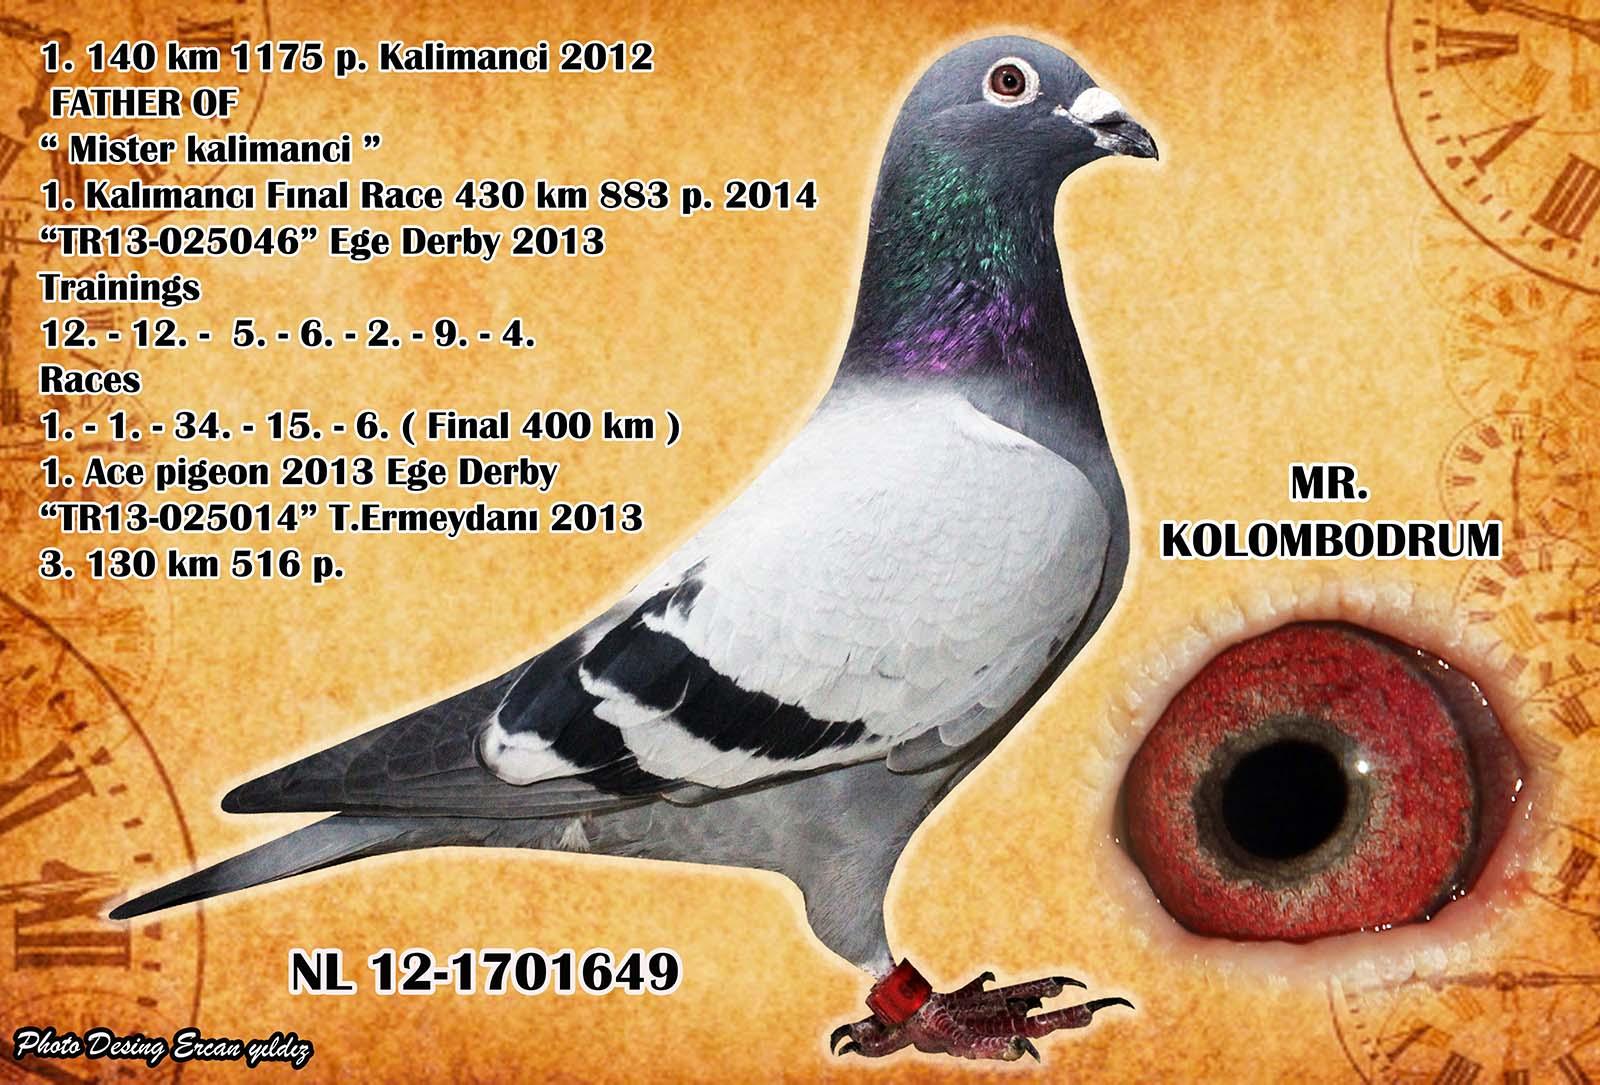 TR15-130764 ERKEK /  BROTHER MISTER KALIMANCI TORUNU NIRWANA TORUNU DERBY 16 AS 1